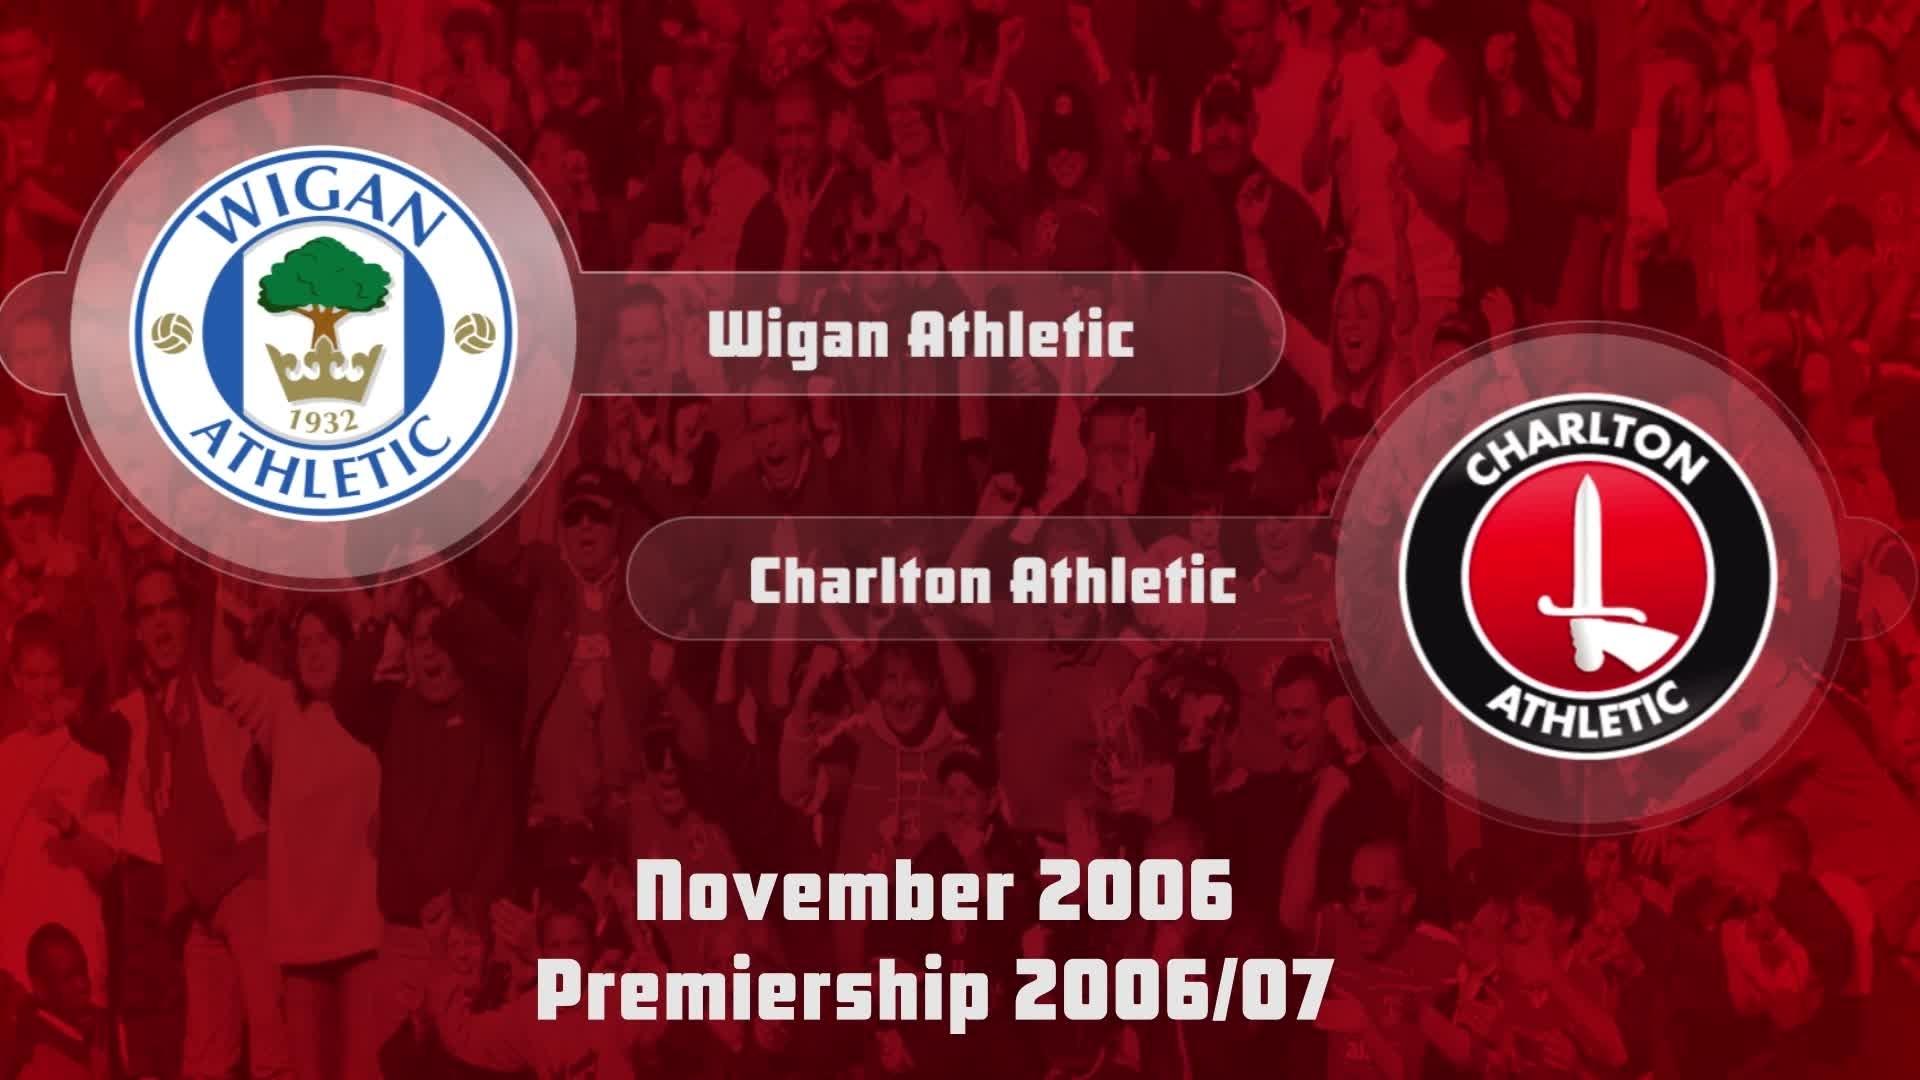 15 HIGHLIGHTS | Wigan Athletic 3 Charlton 2 (Nov 2006)